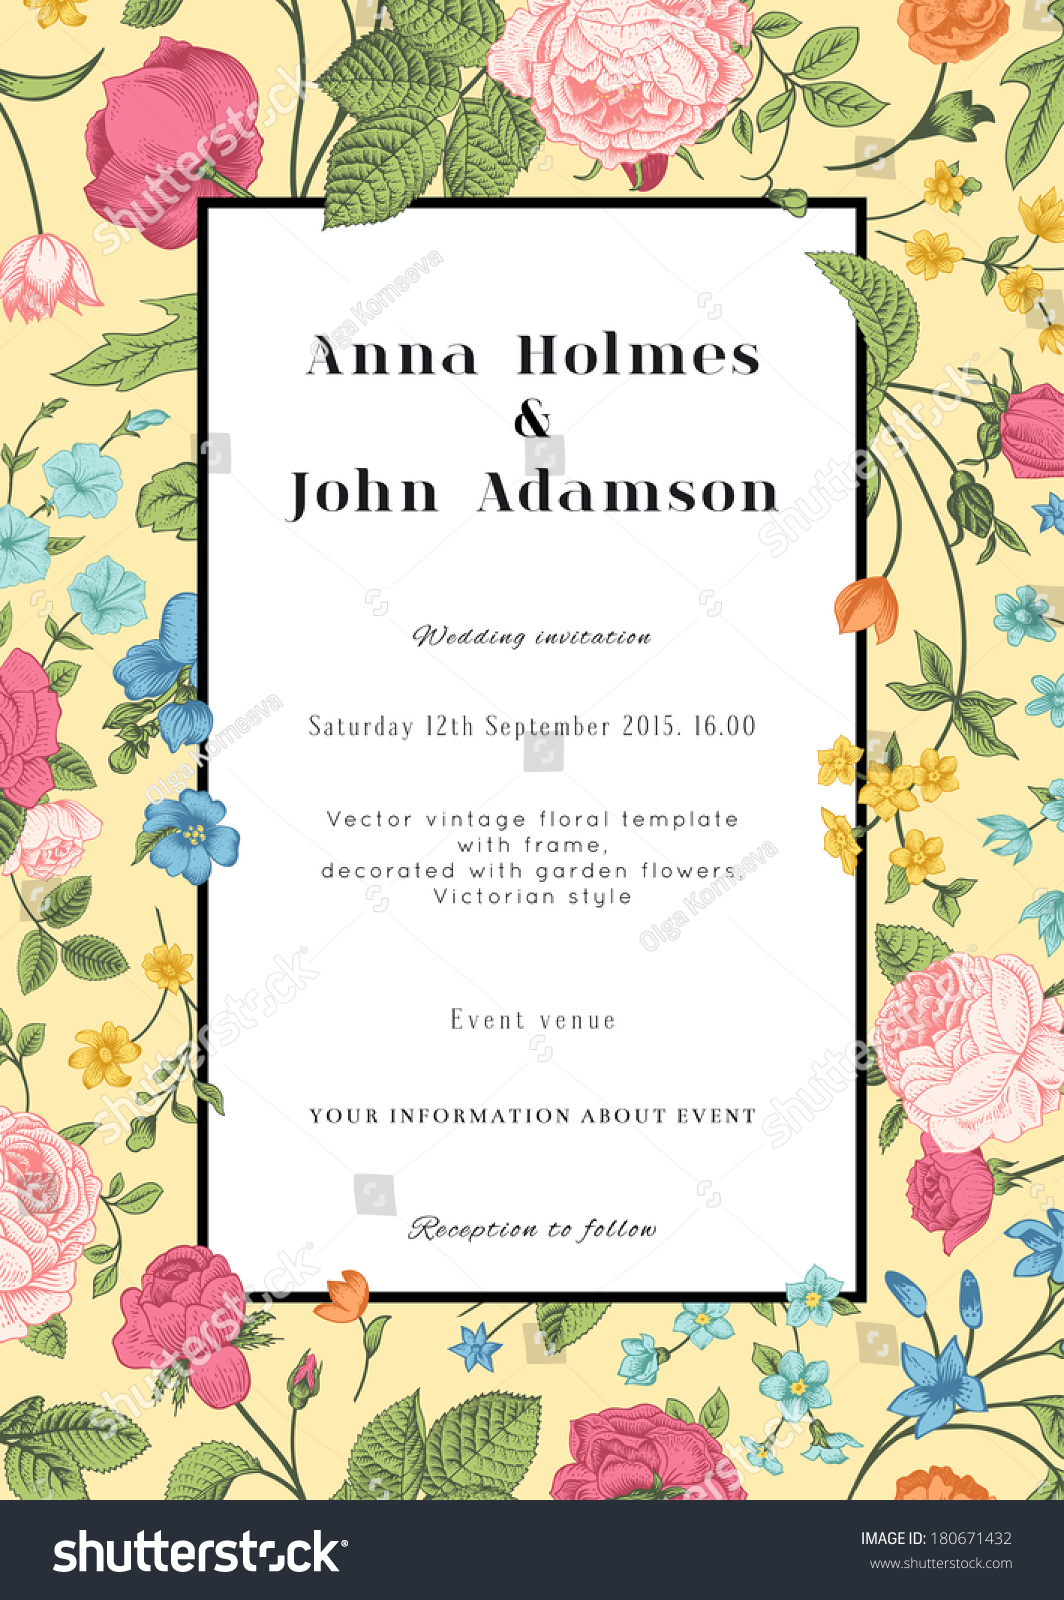 Vector Vertical Vintage Floral Wedding Invitation Stock Vector ...